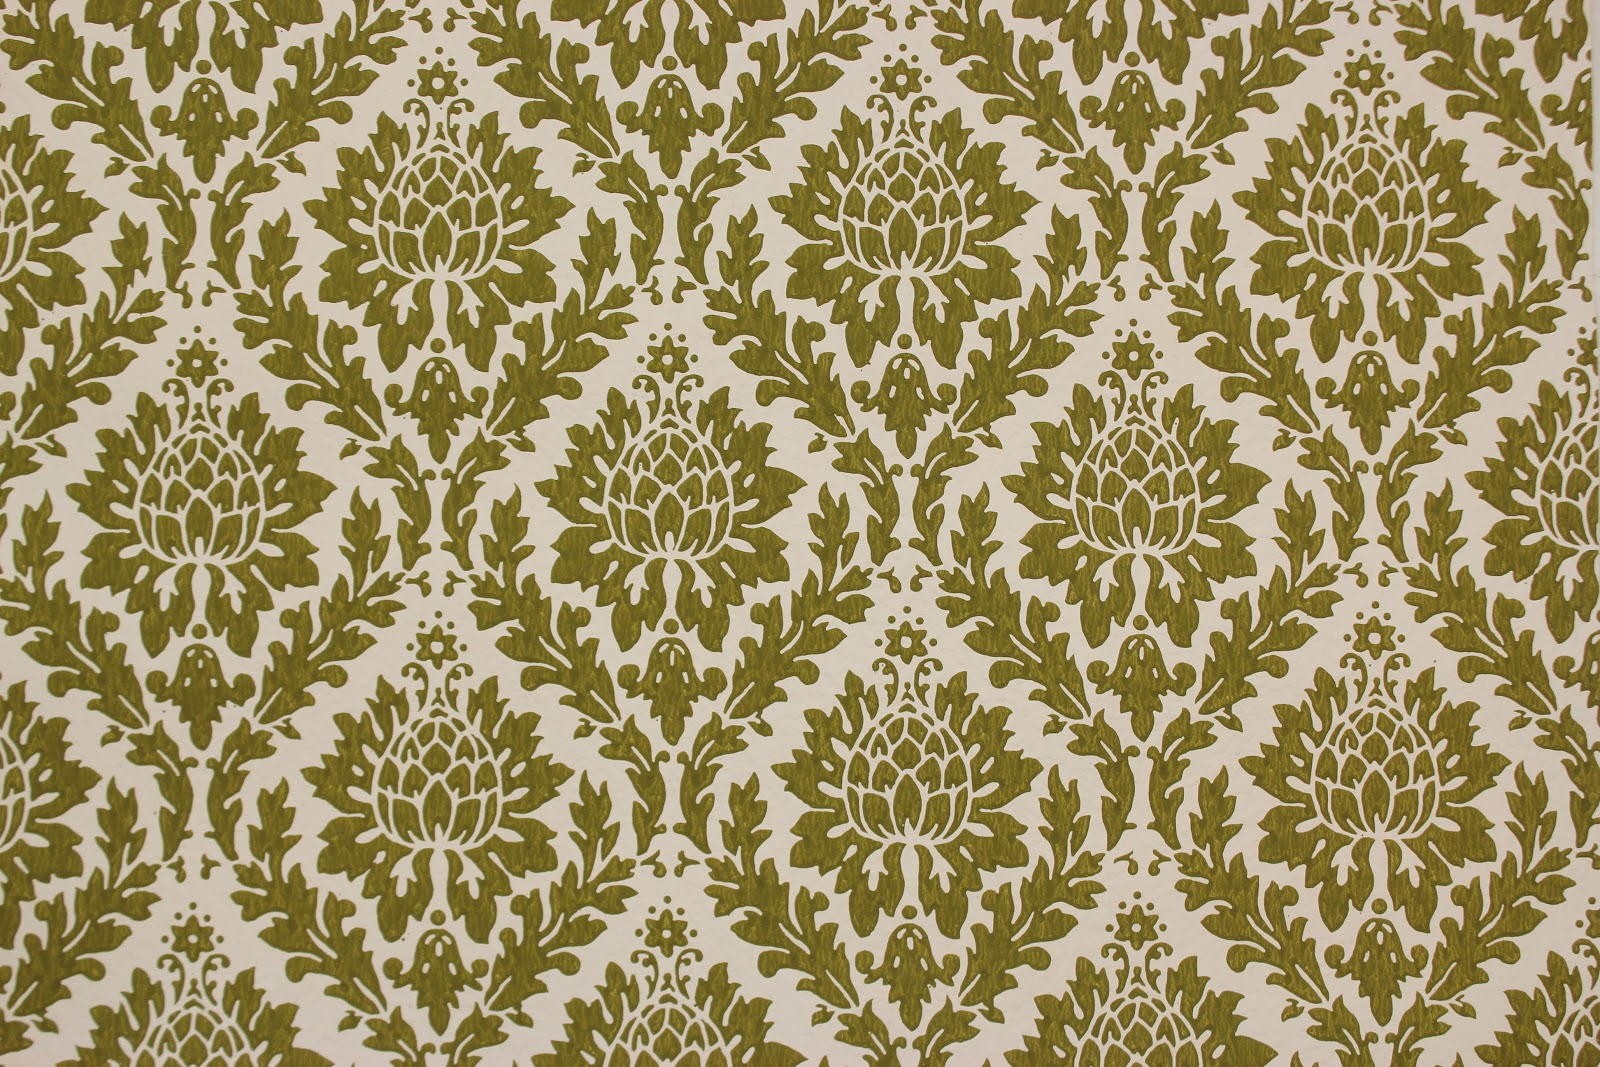 pattern that feels geometric wallpaper patterns vintage wallpaper bit 1600x1067